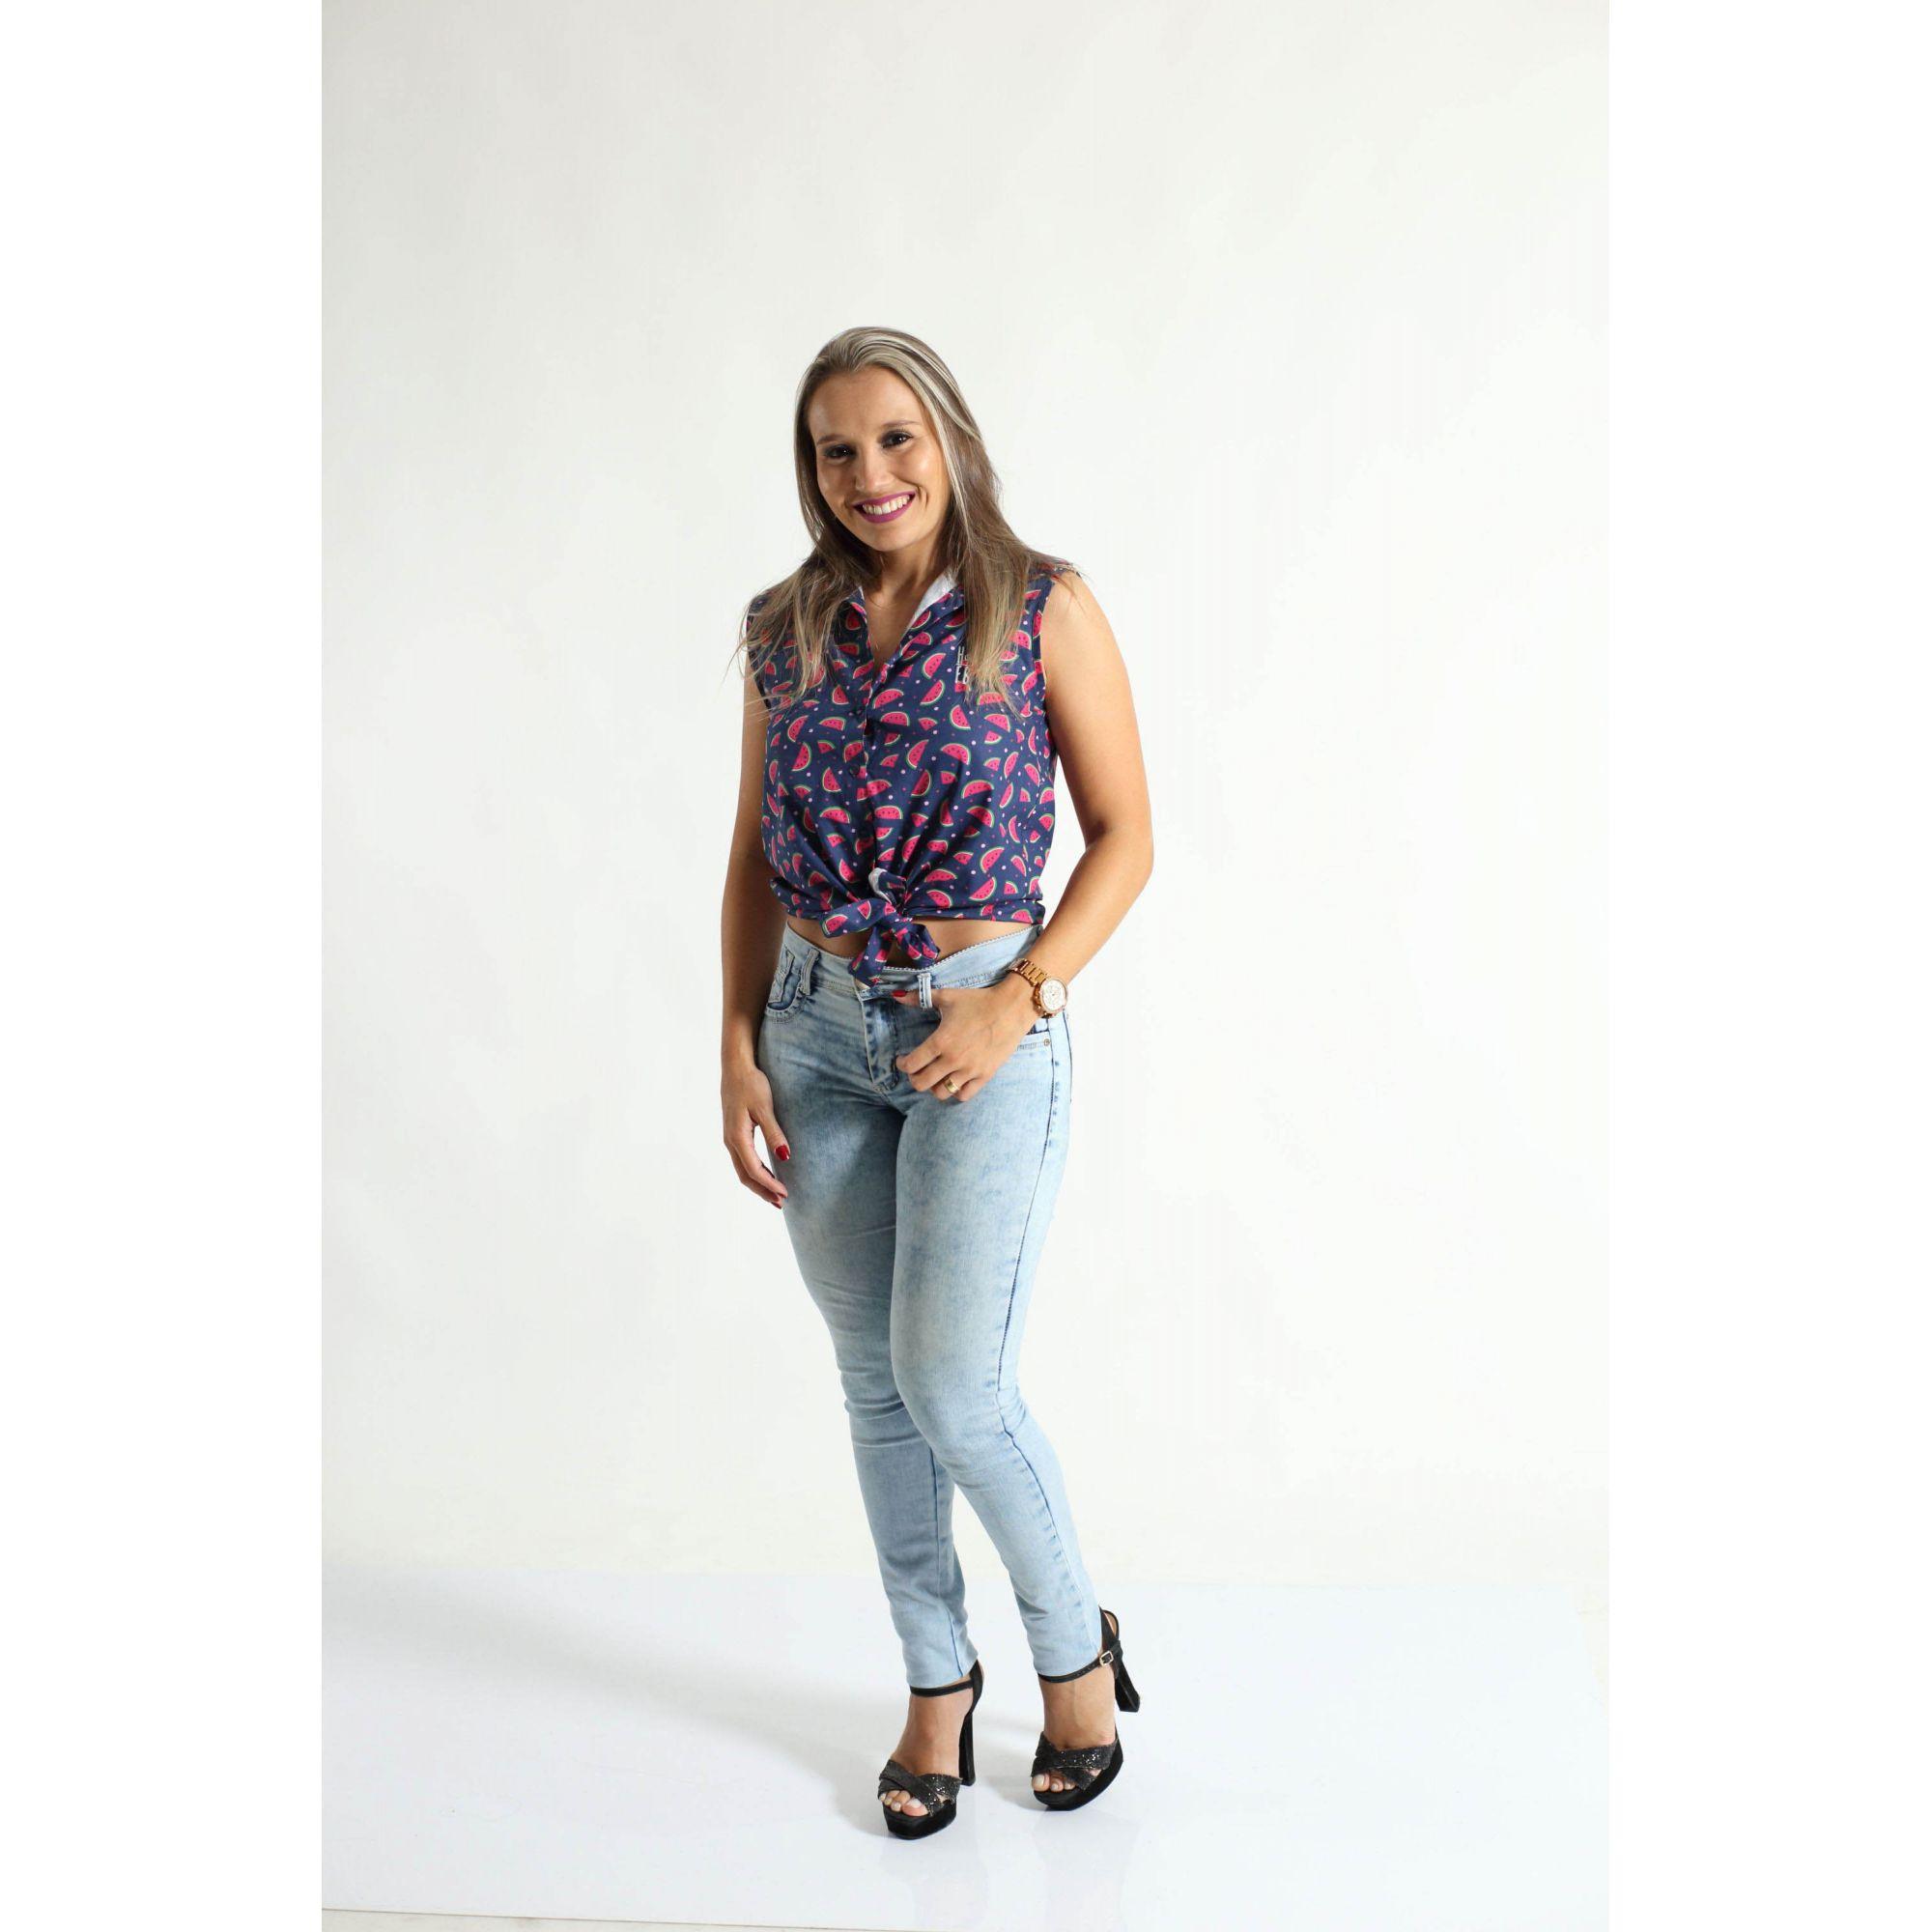 Camisa Social Sem Manga Melancia Feminina Adulta  - Heitor Fashion Brazil